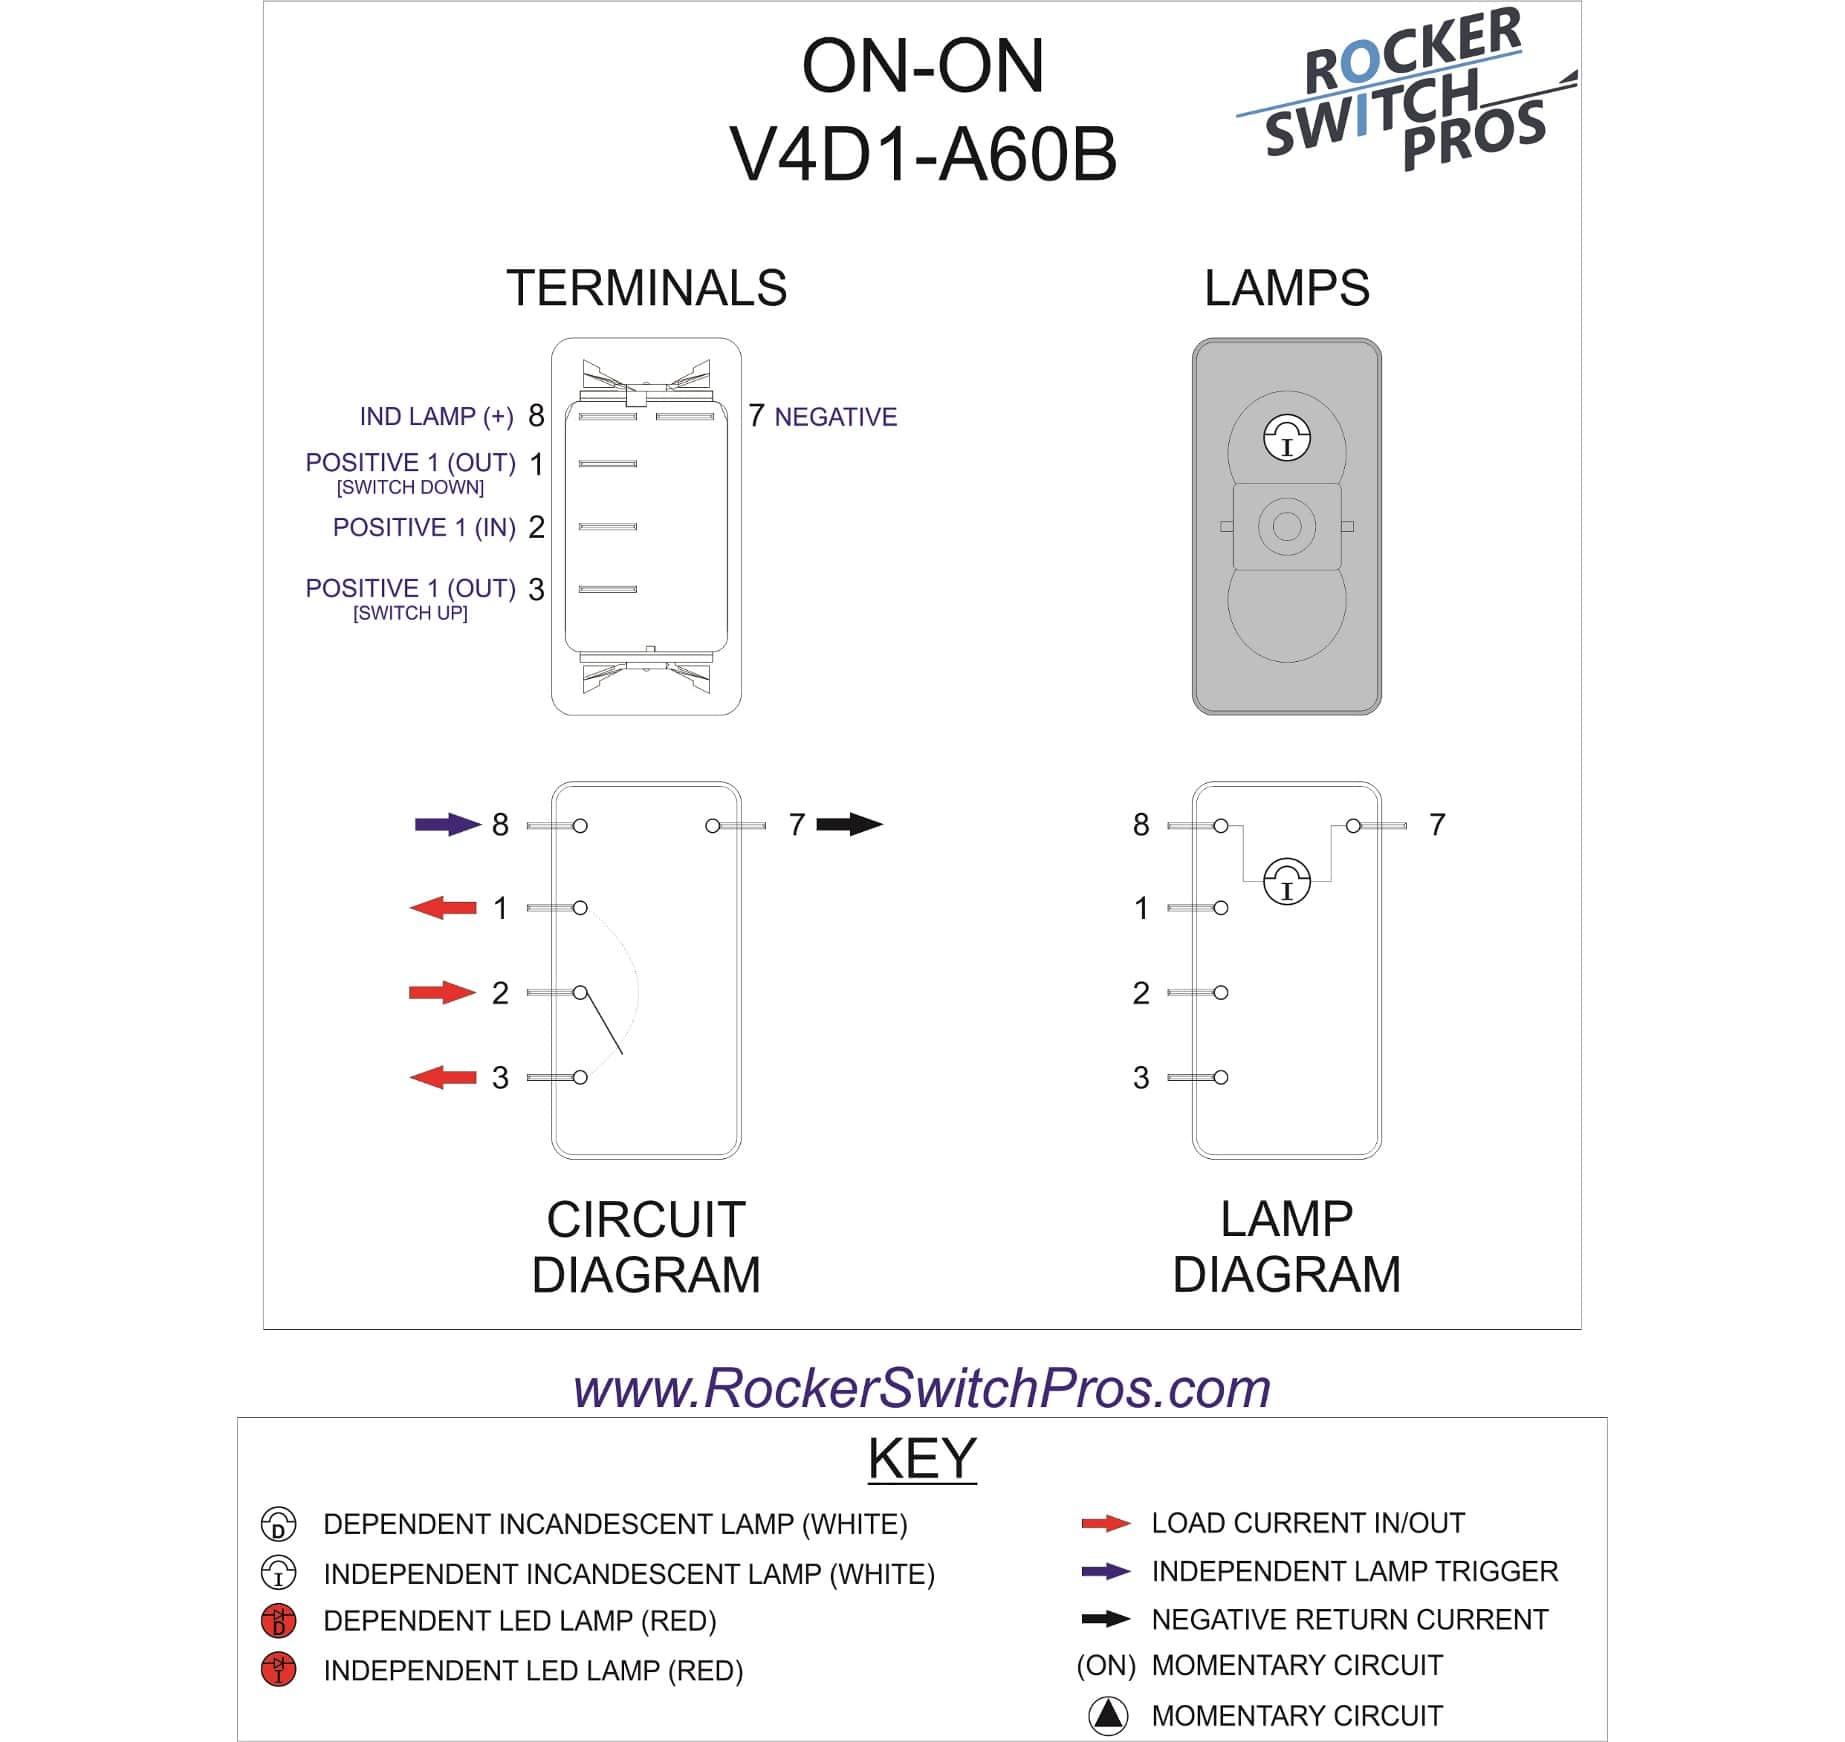 wiring diagram for 3 way rocker switch free download wiring diagram rh xwiaw us Carling Technologies Rocker Switch Wiring Diagram Four Position Toggle Switch Wiring Diagram